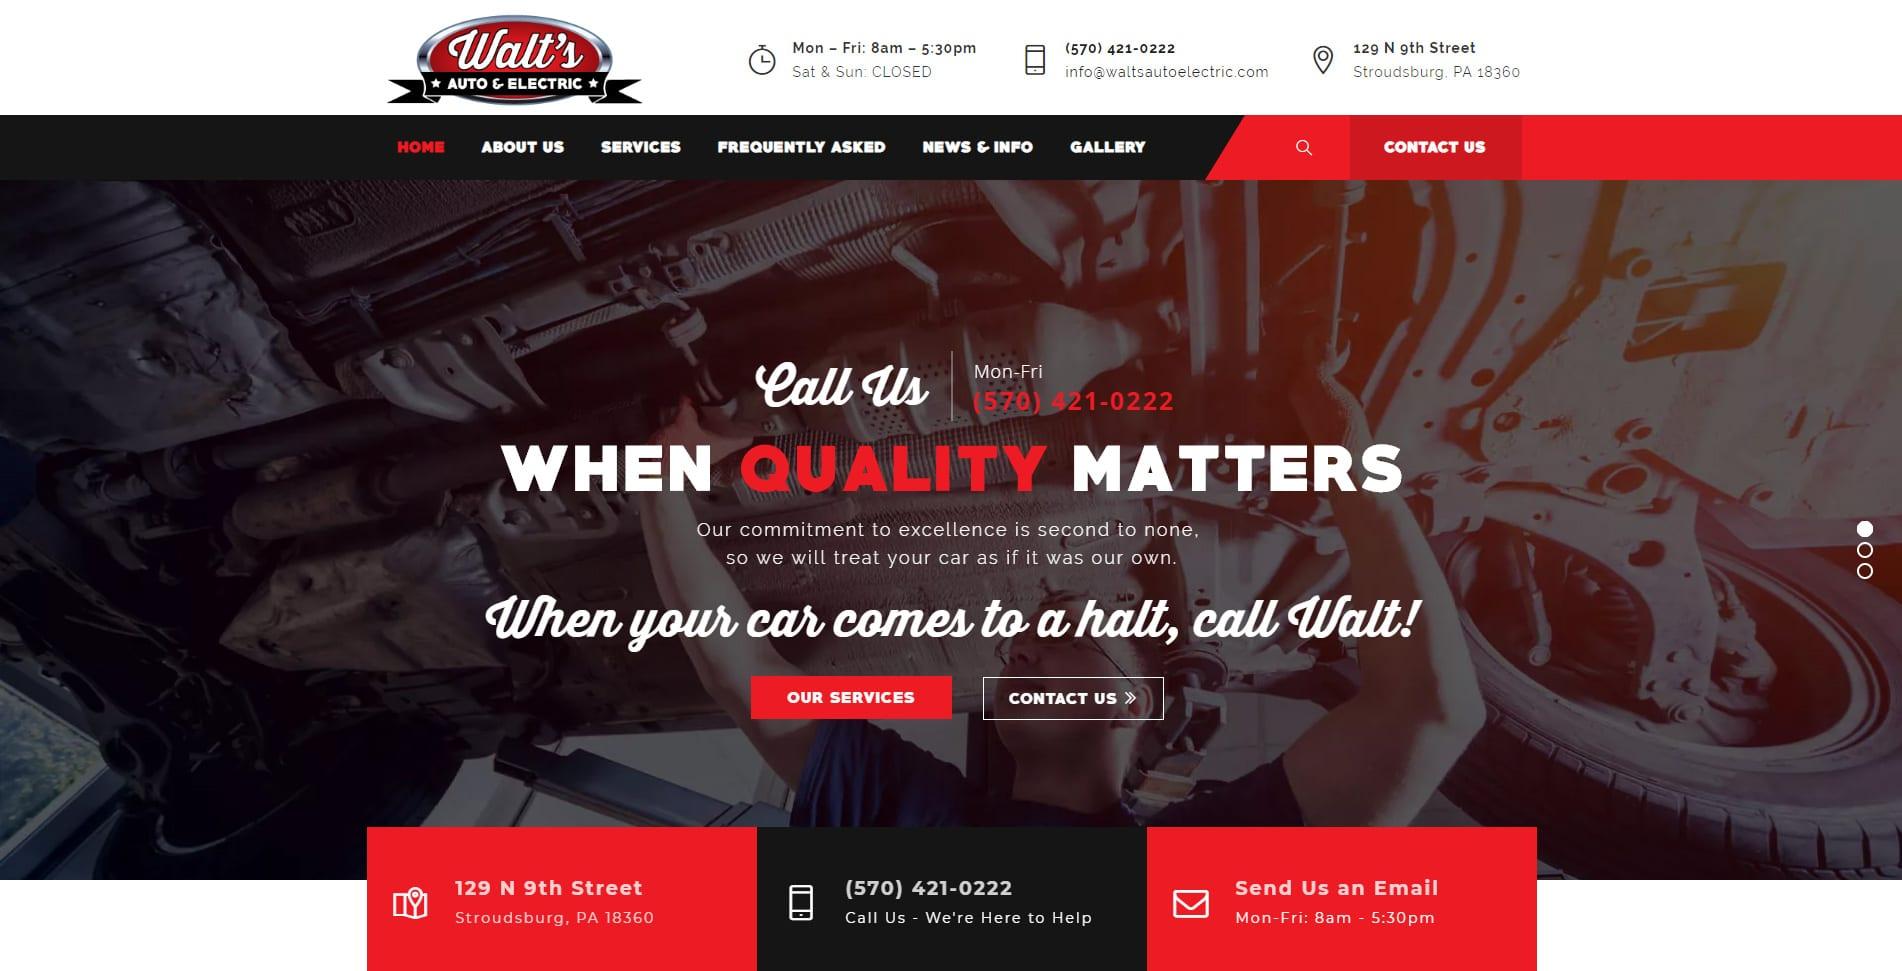 Walt's Auto & Electric - Stroudsburg, PA